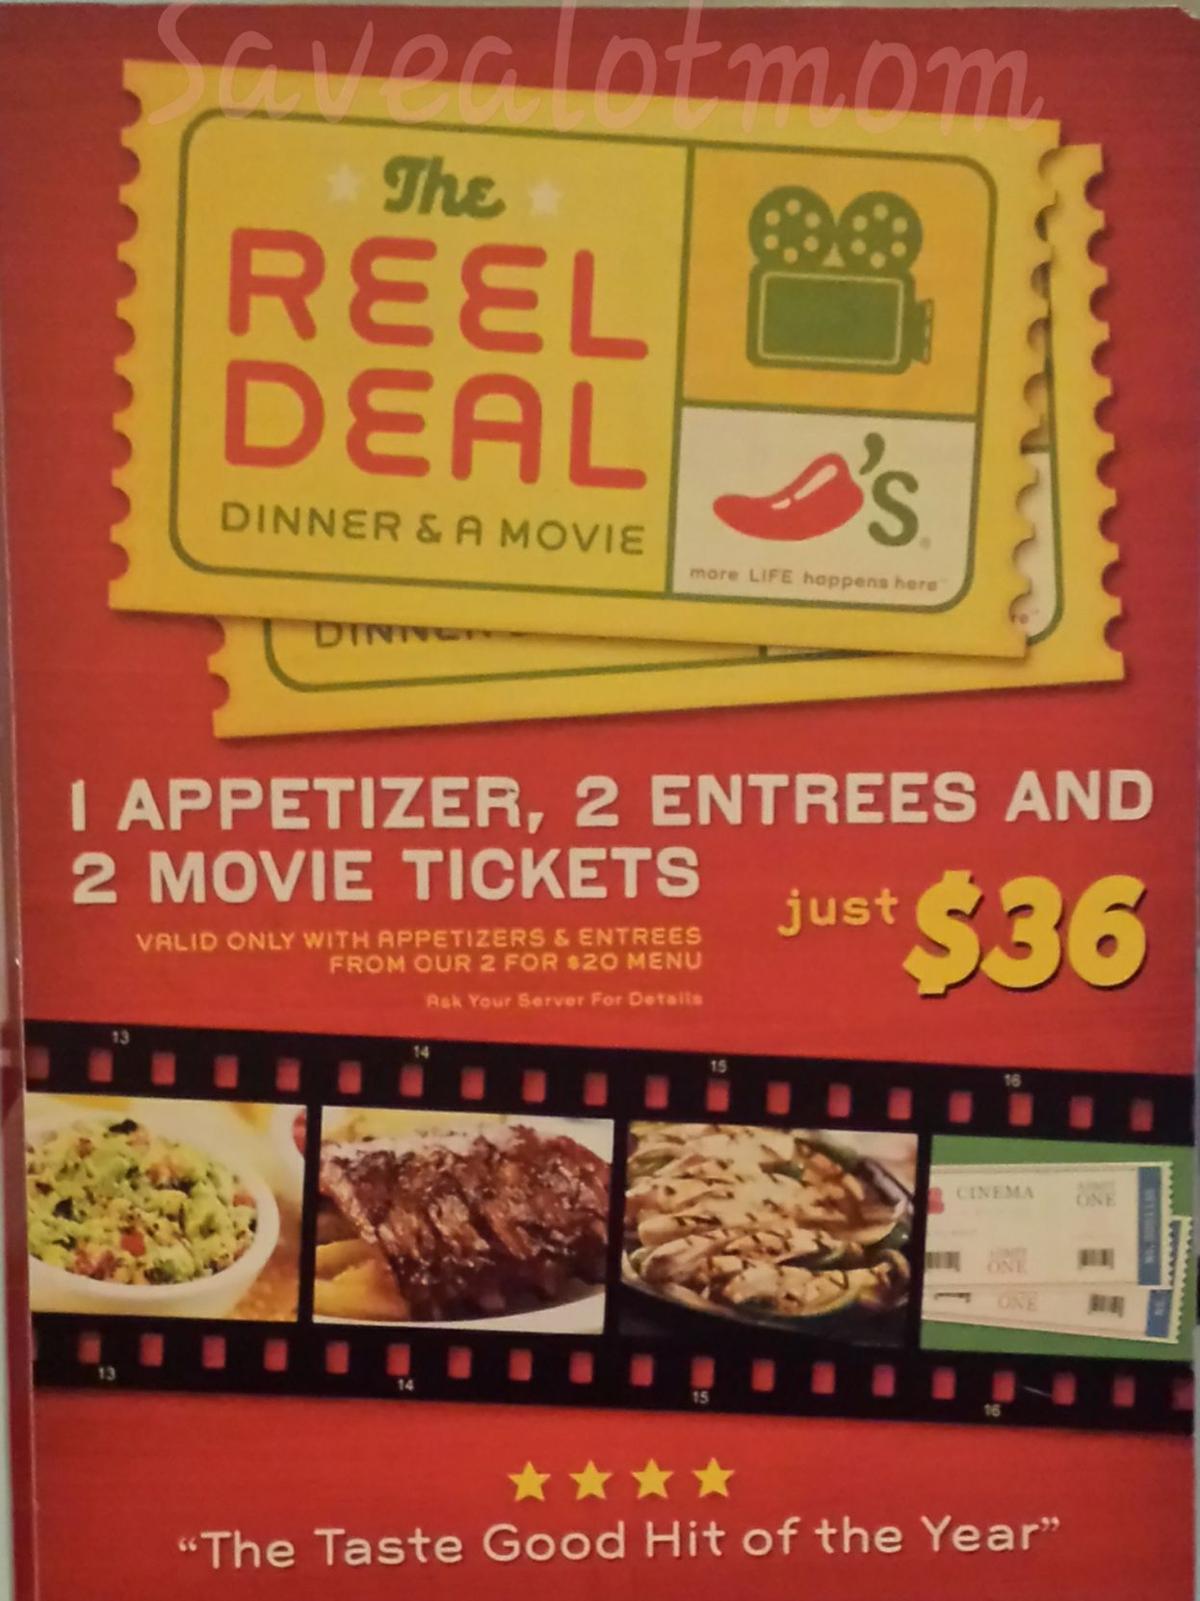 Chilis Deals!